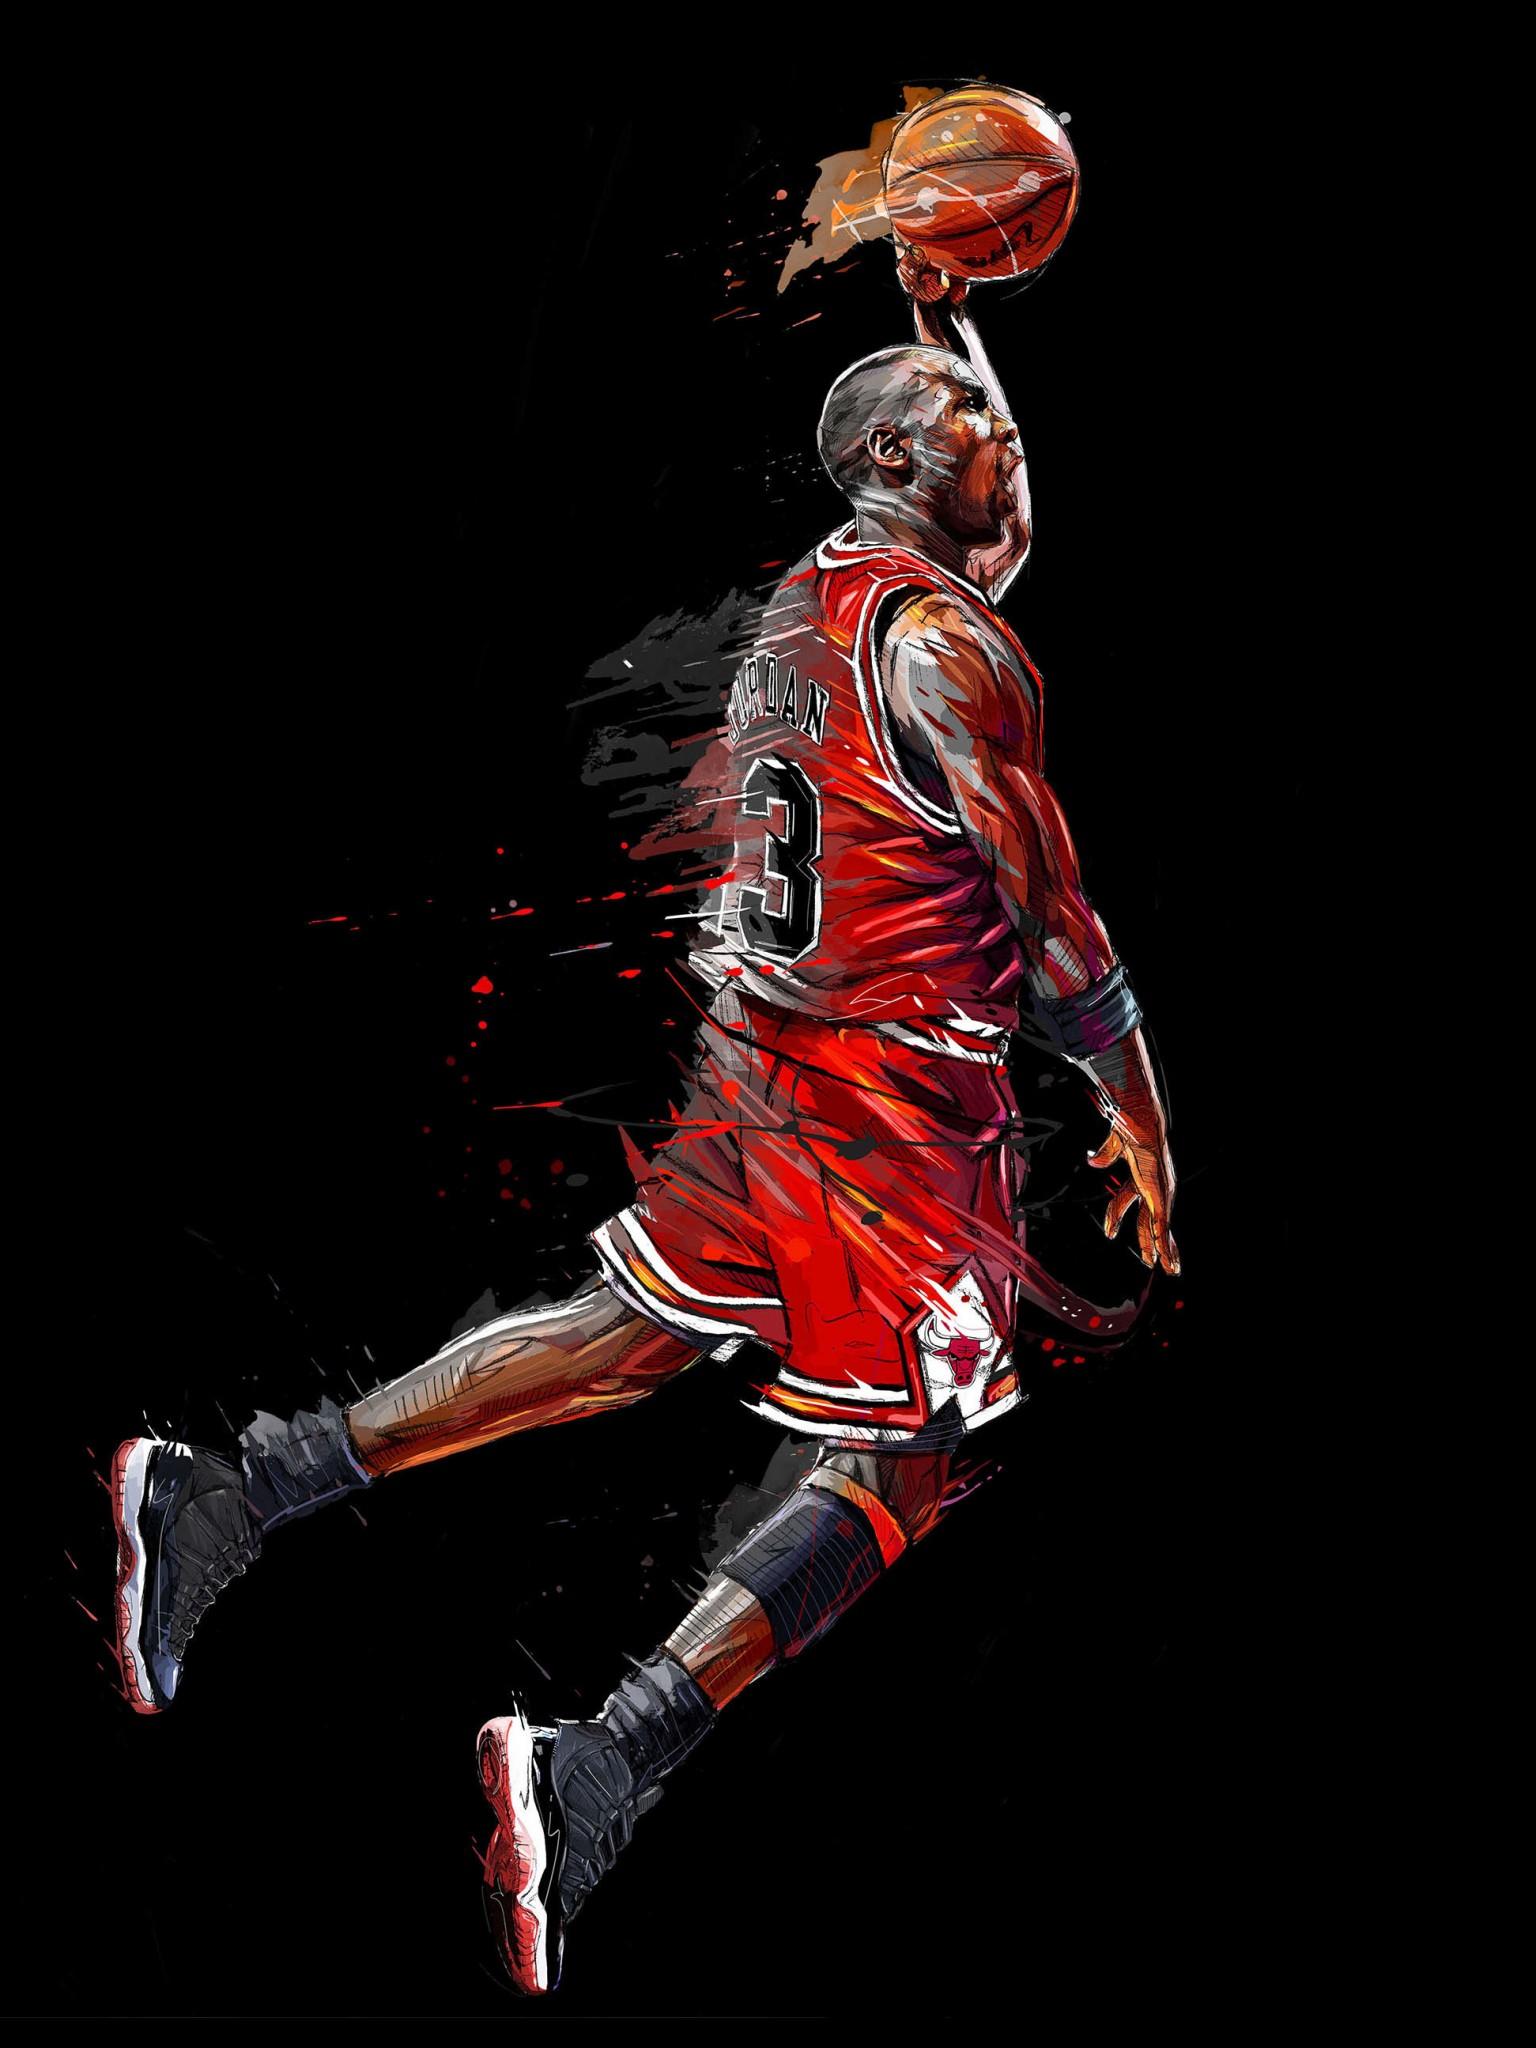 Michael Jordan Fan Art 1536x2048 Download Hd Wallpaper Wallpapertip